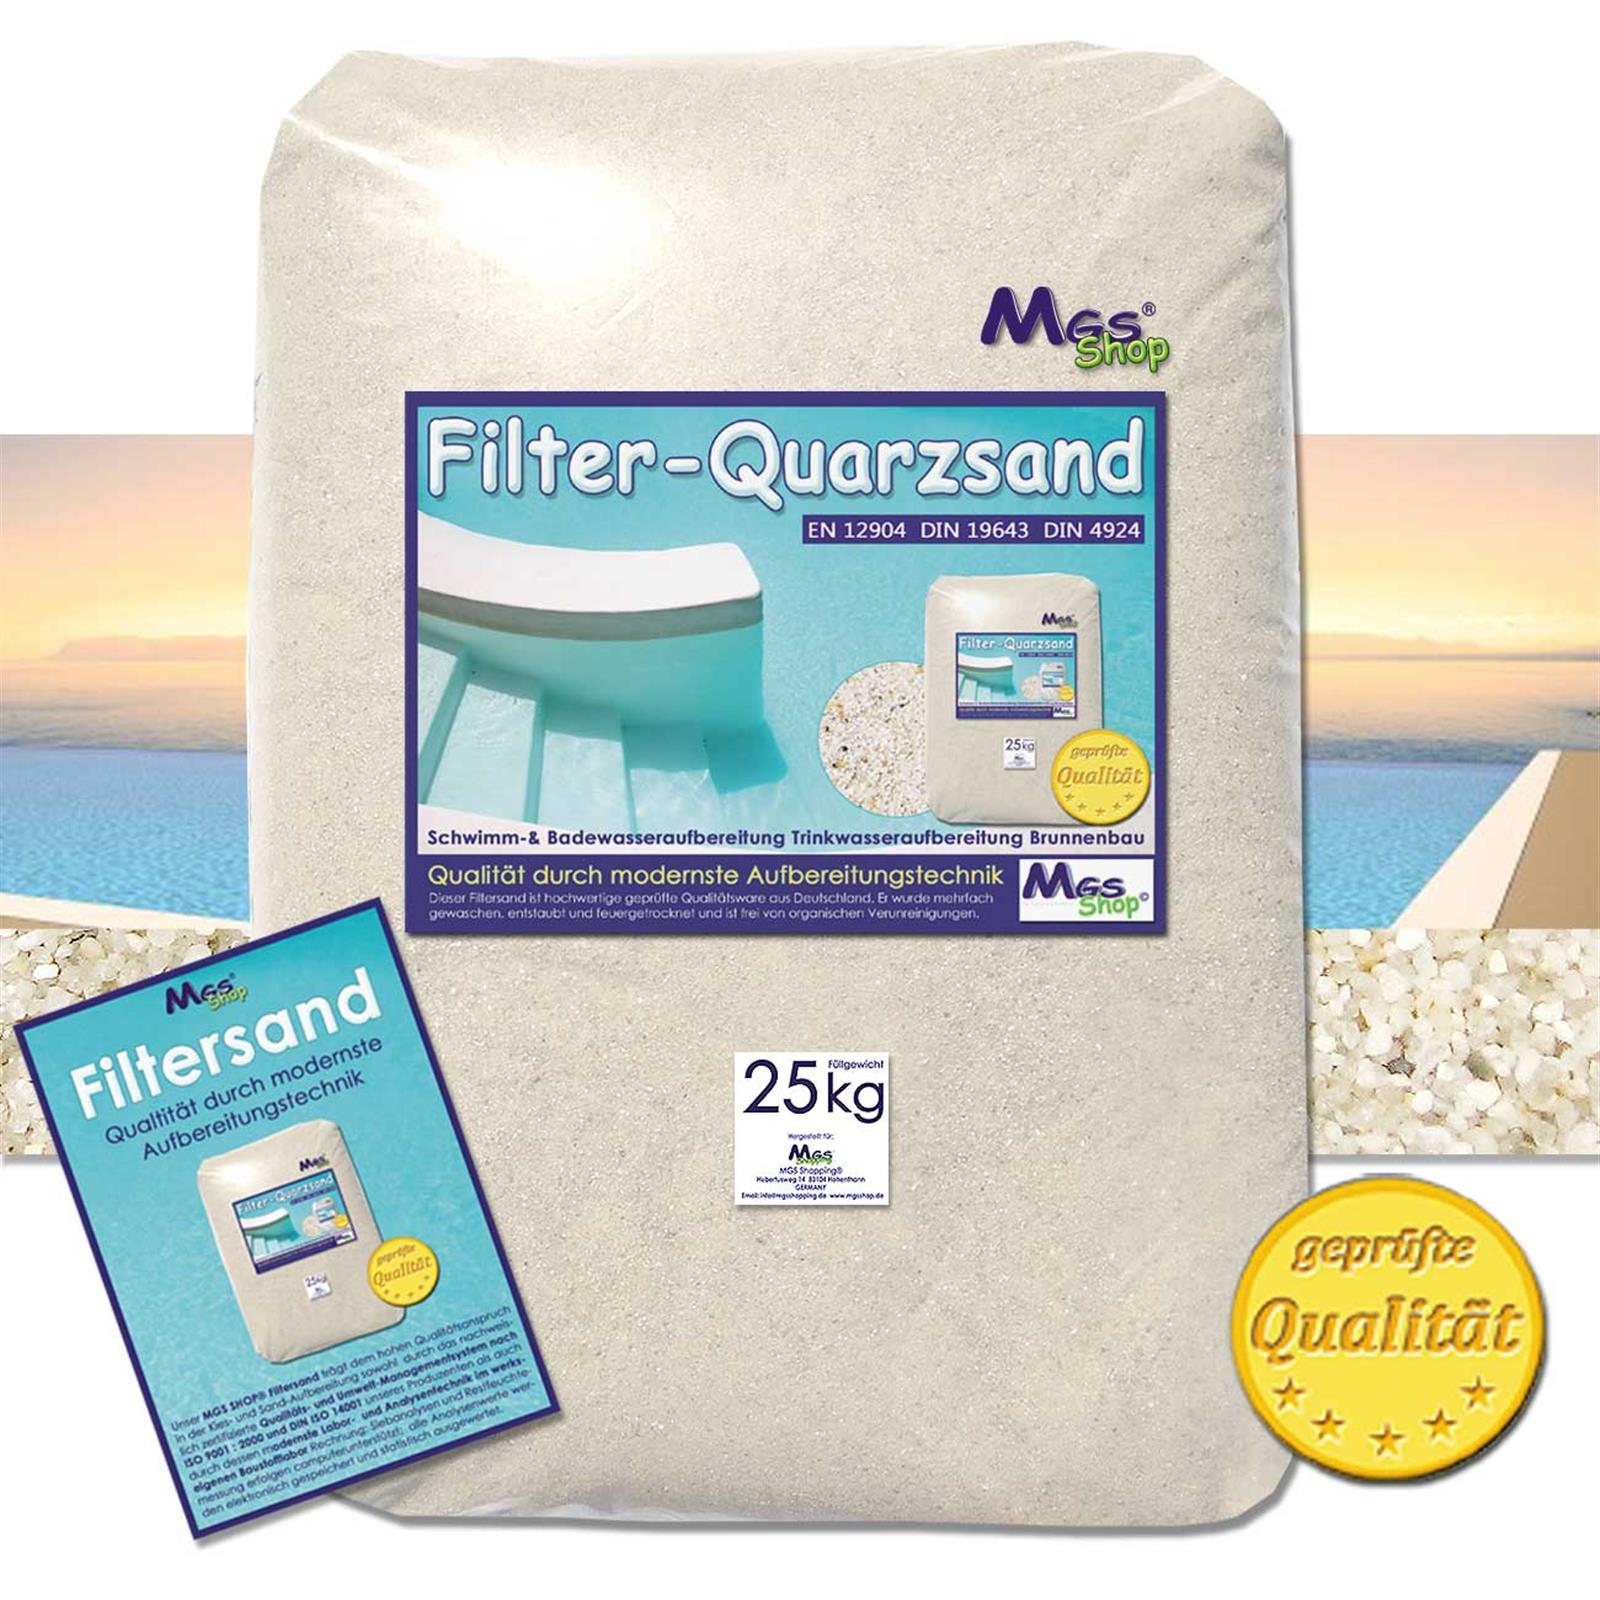 Extrem Filtersand für Pool- und Filteranlagen gemäß DIN EN 15798 AV72